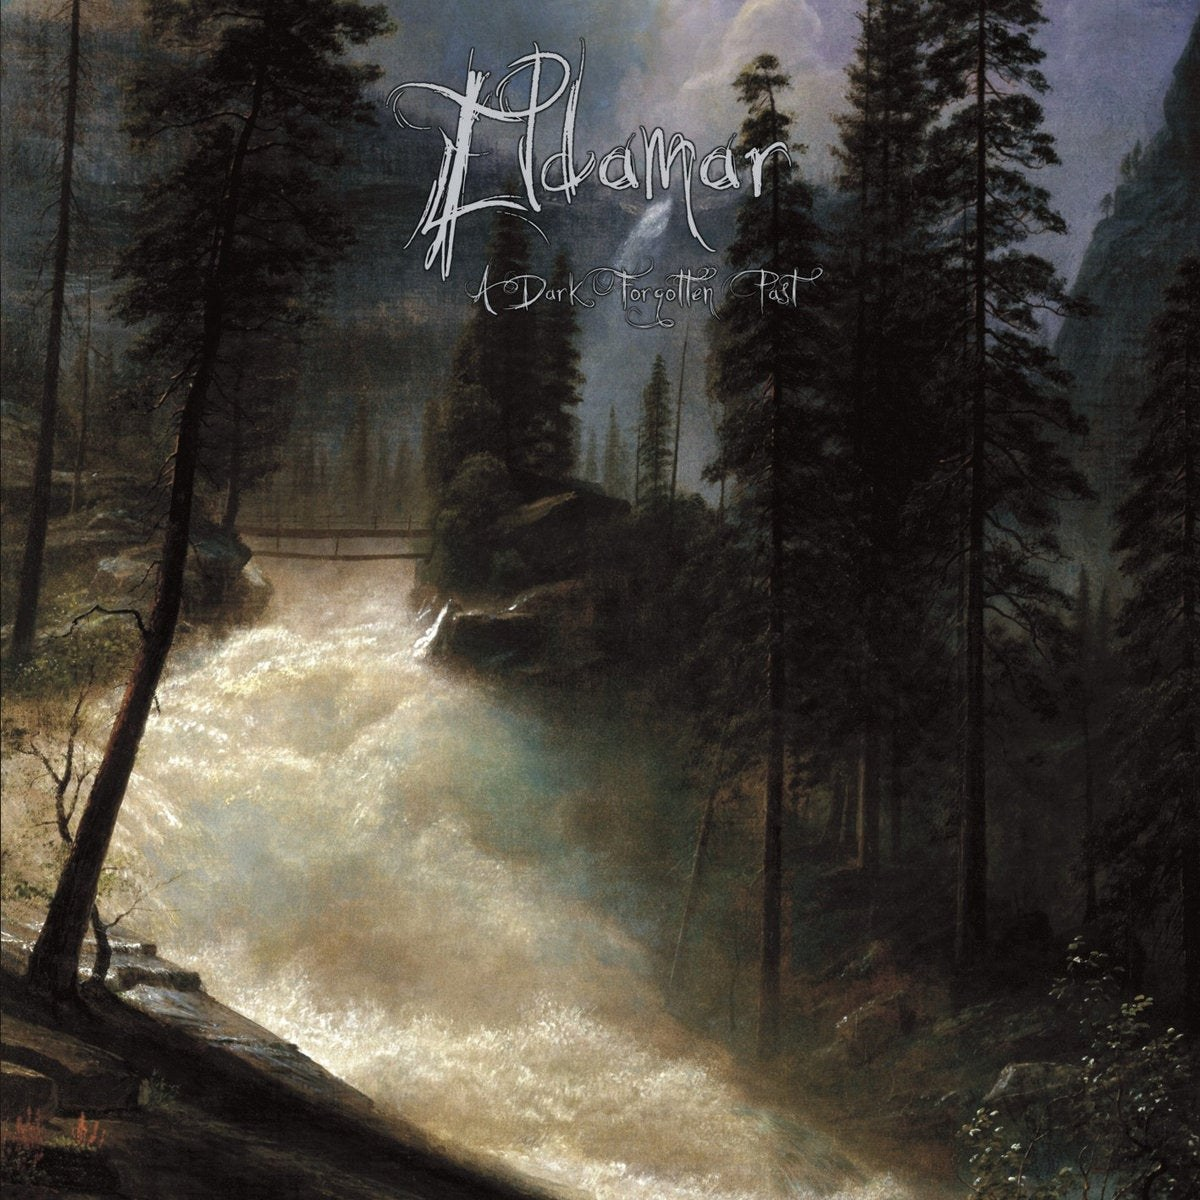 Reviews for Eldamar - A Dark Forgotten Past